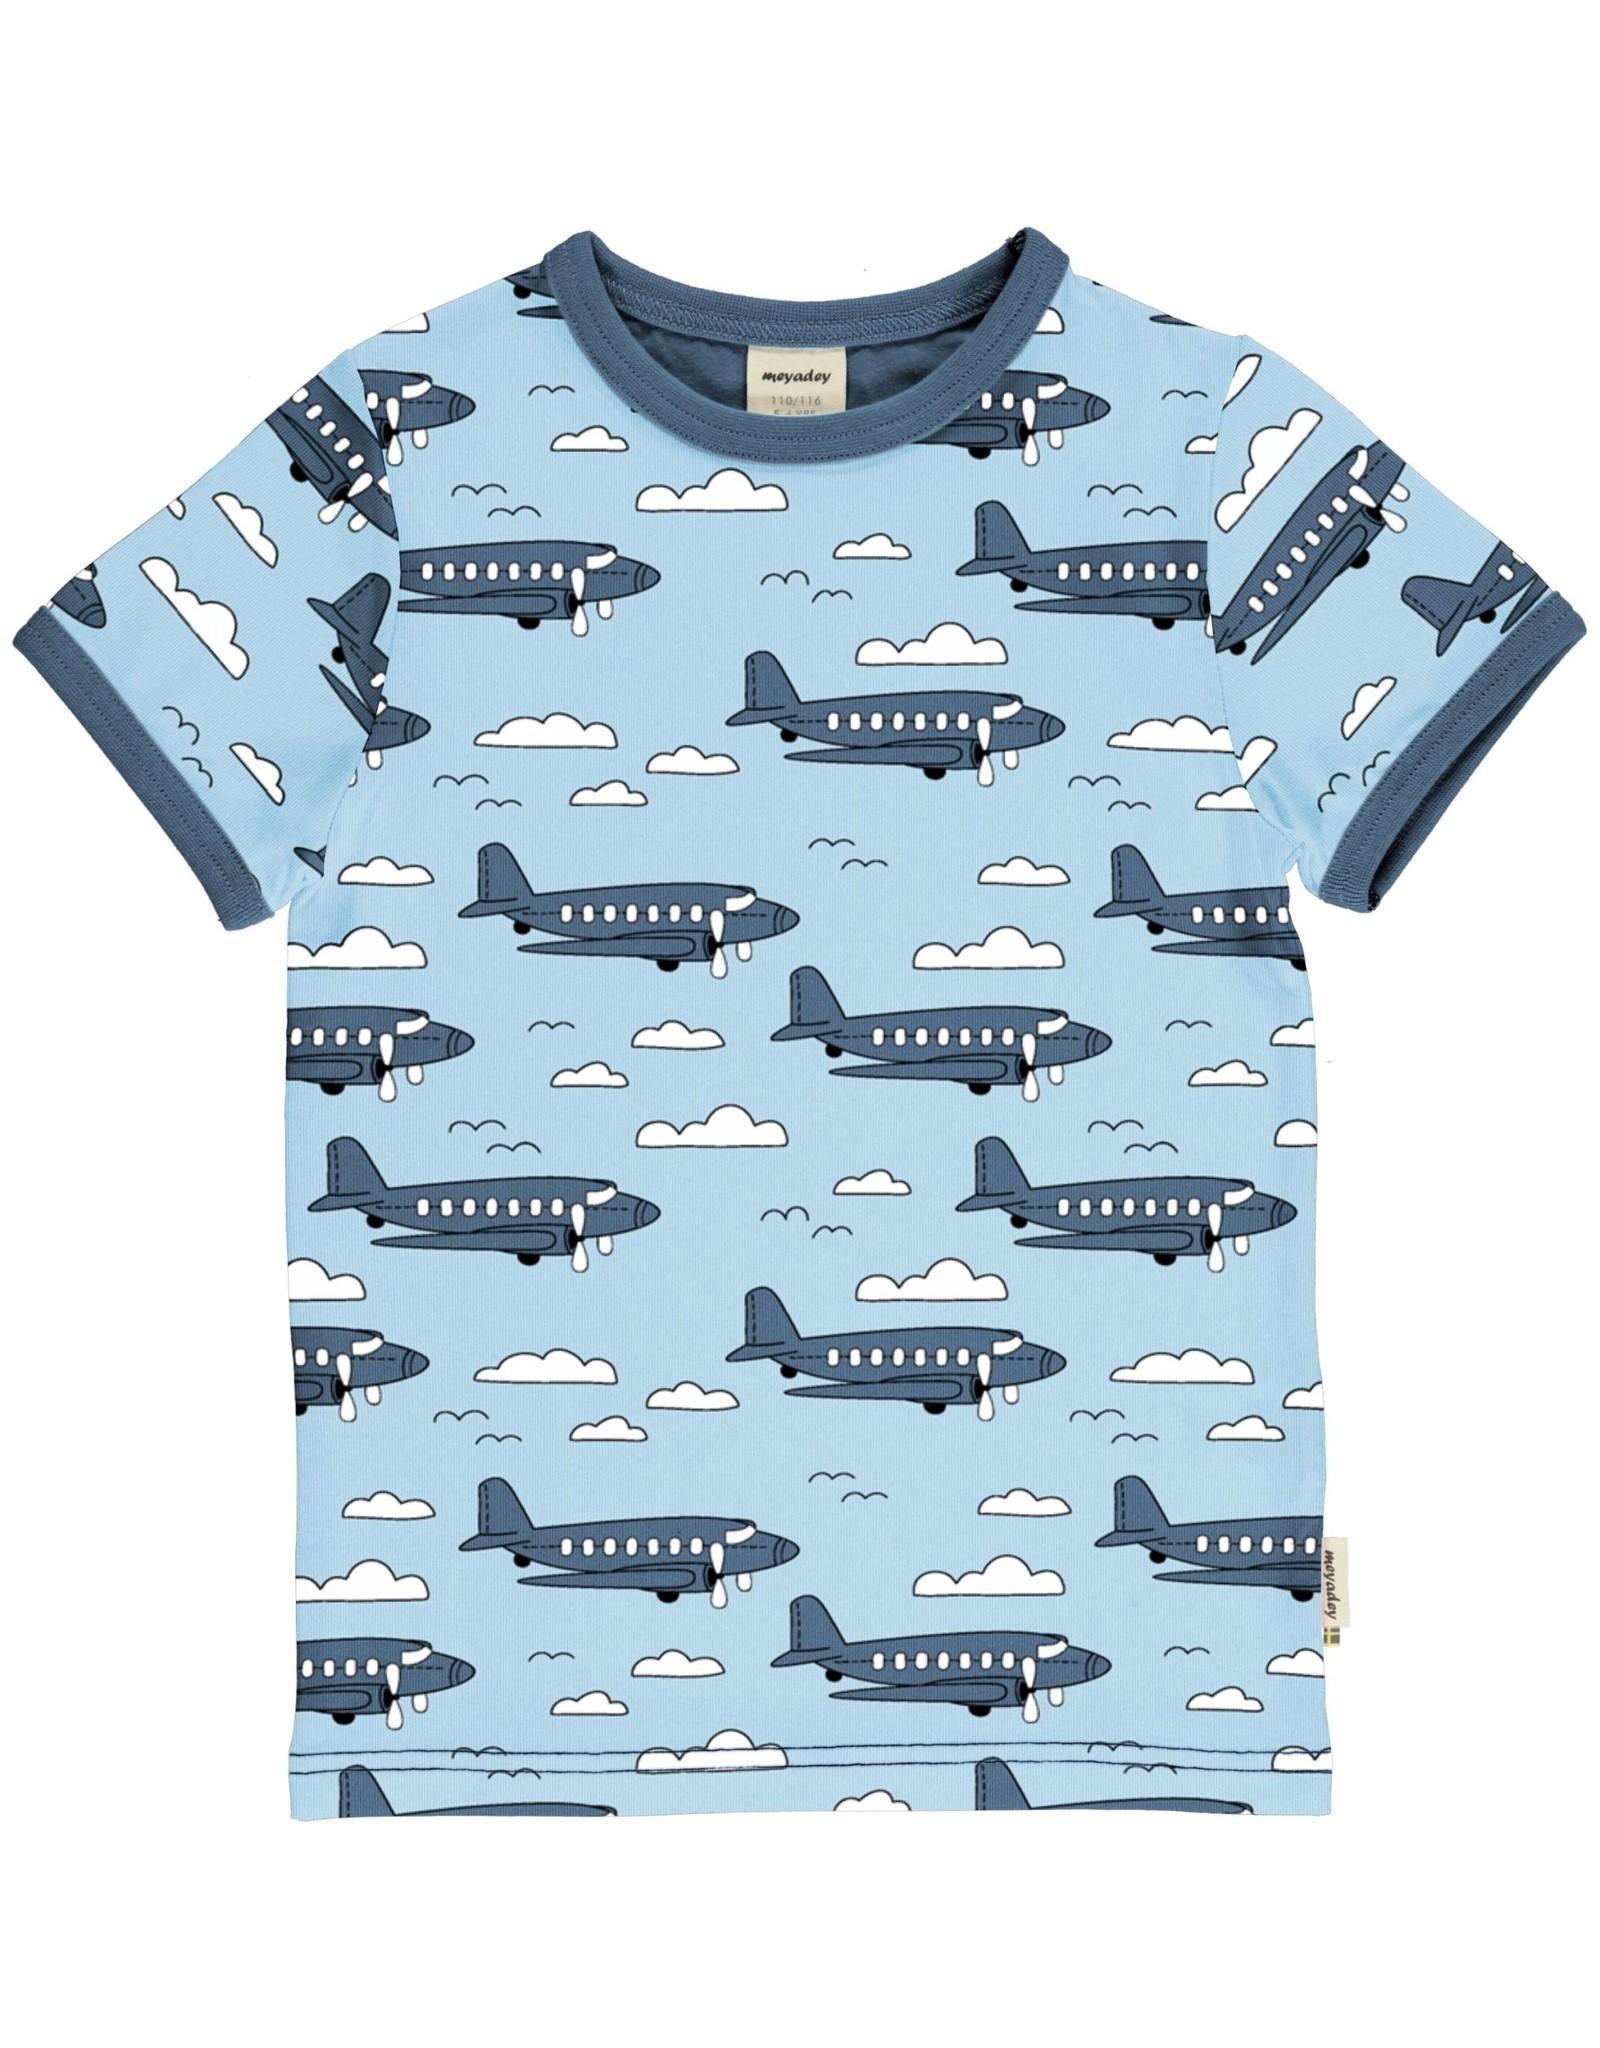 Meyadey T-shirt met vliegtuigen